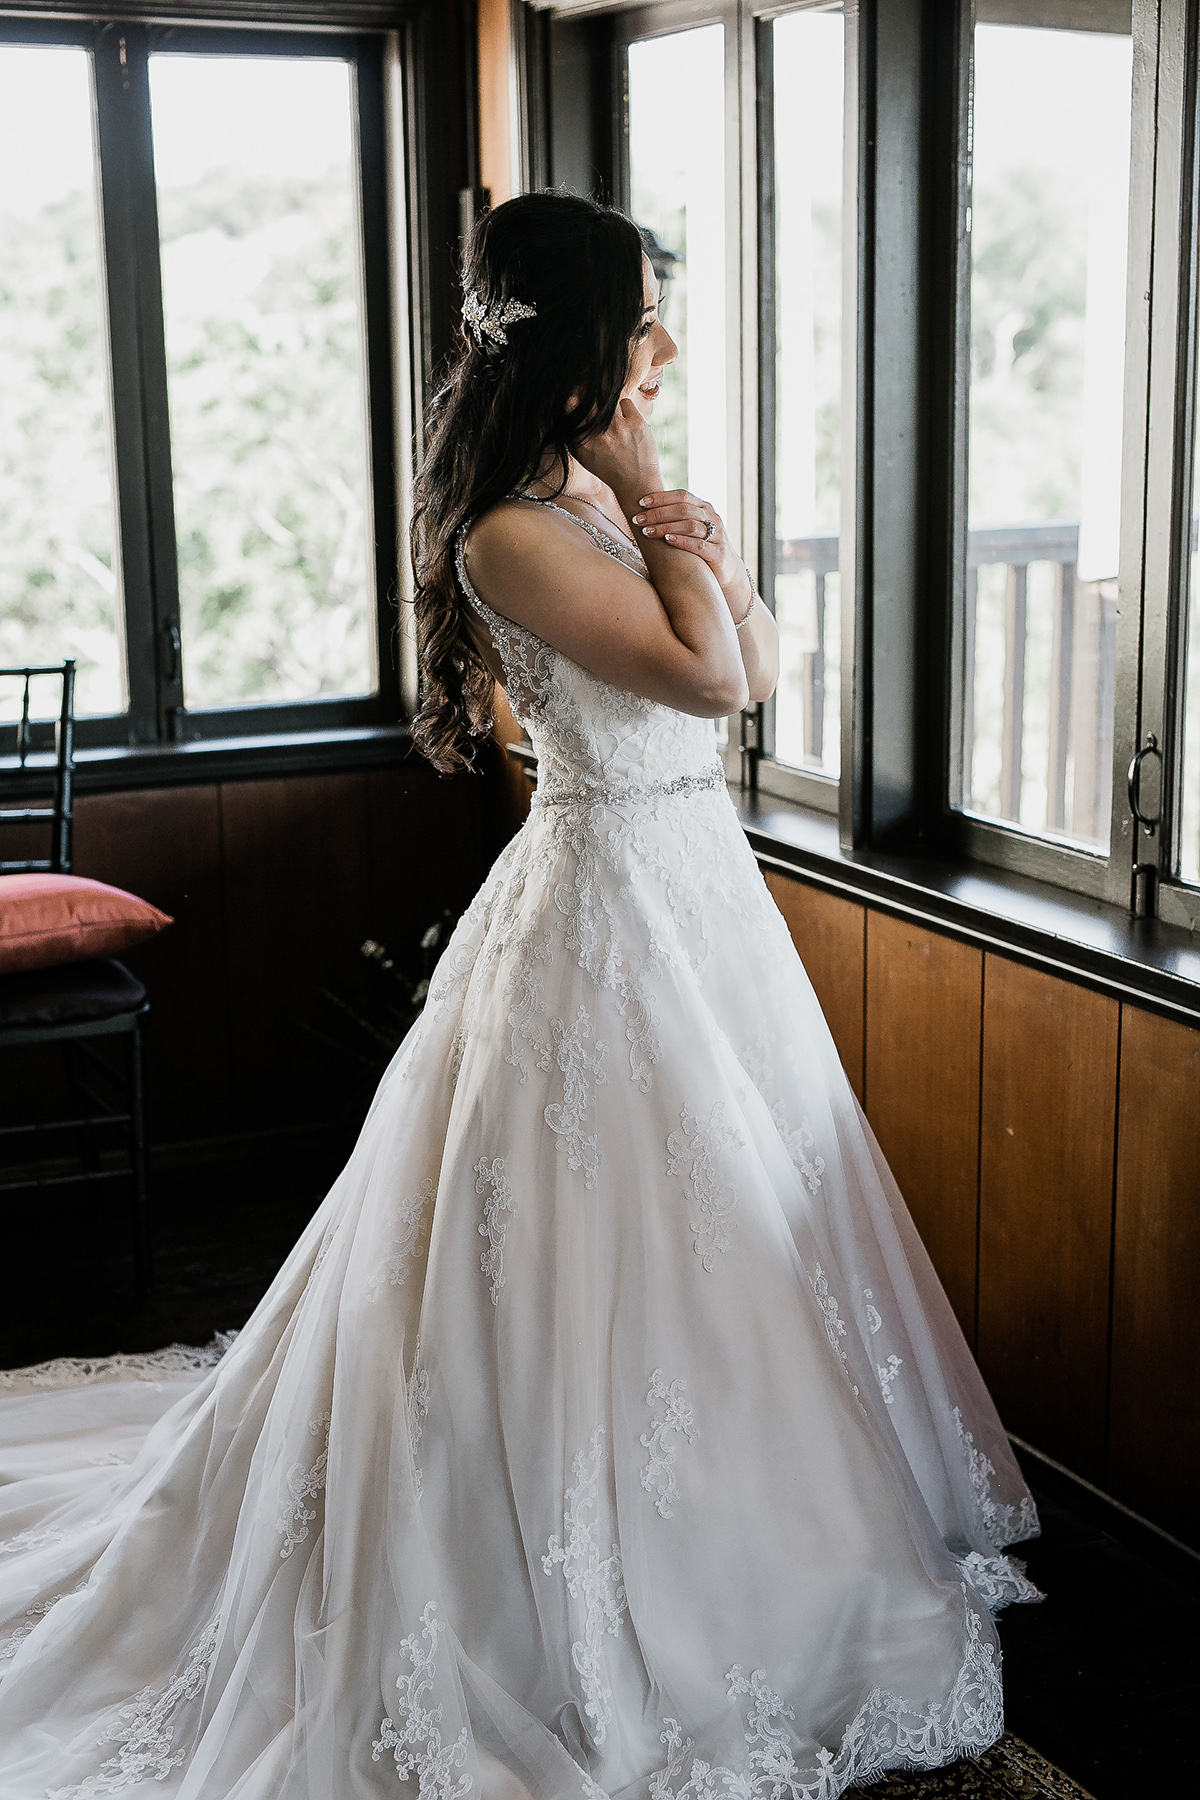 kristine_robert_wedding042.jpg